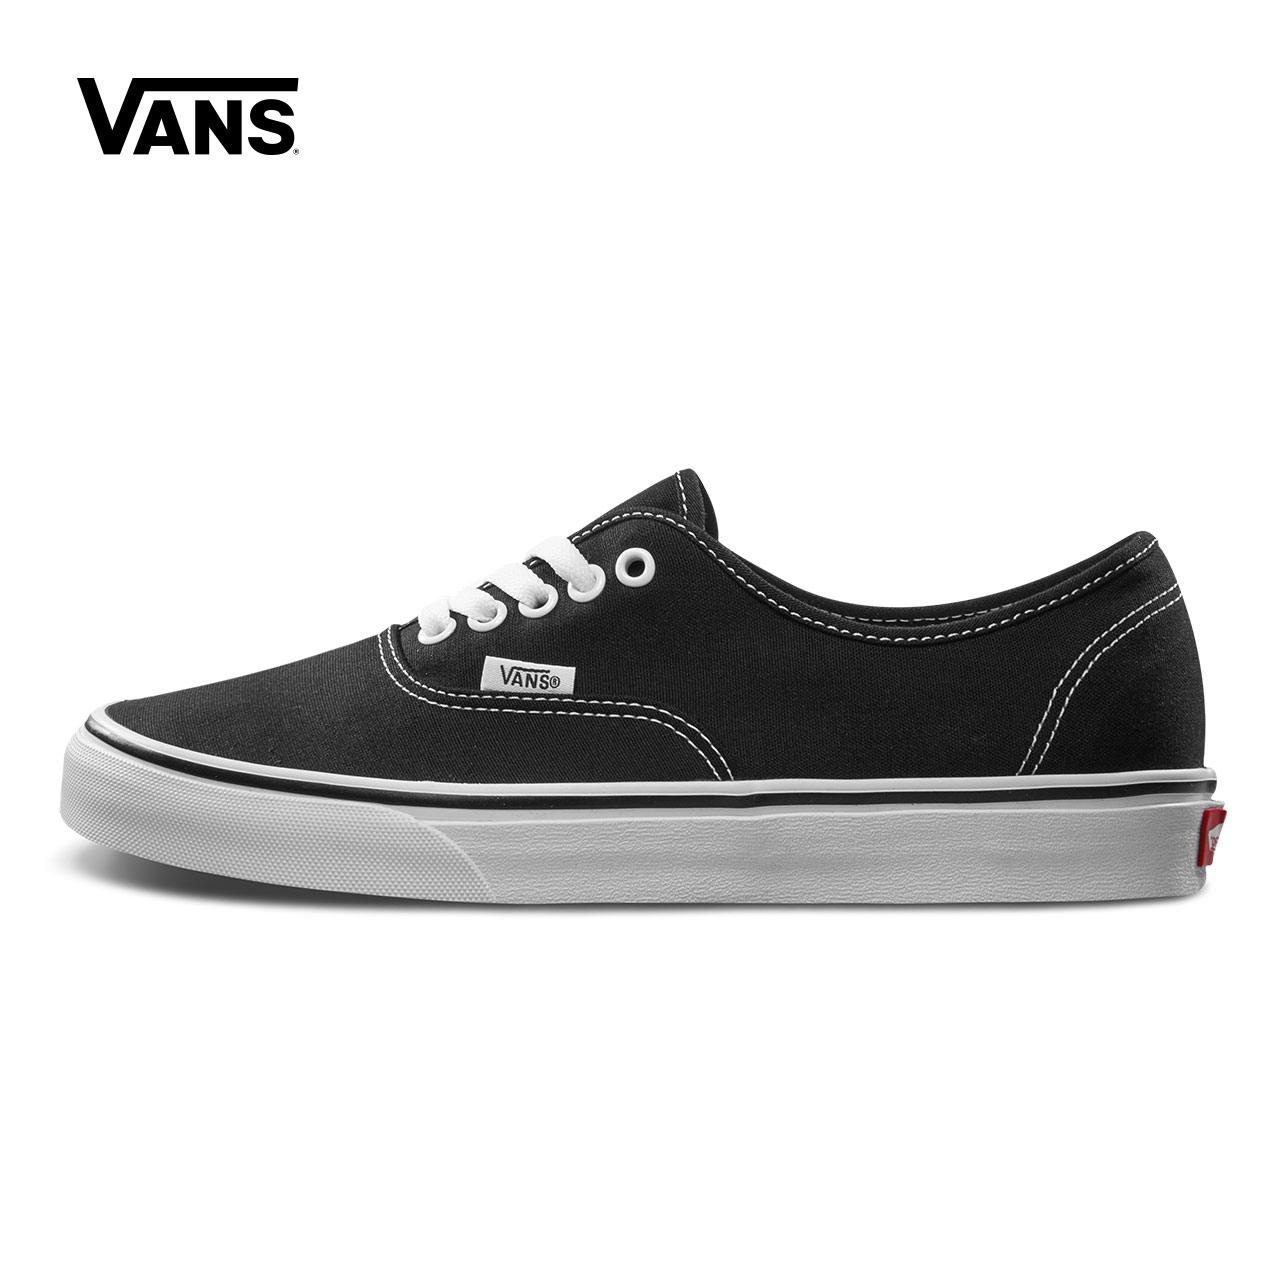 Vans範斯官方正品 經典款Authentic低幫情侶款運動帆布鞋